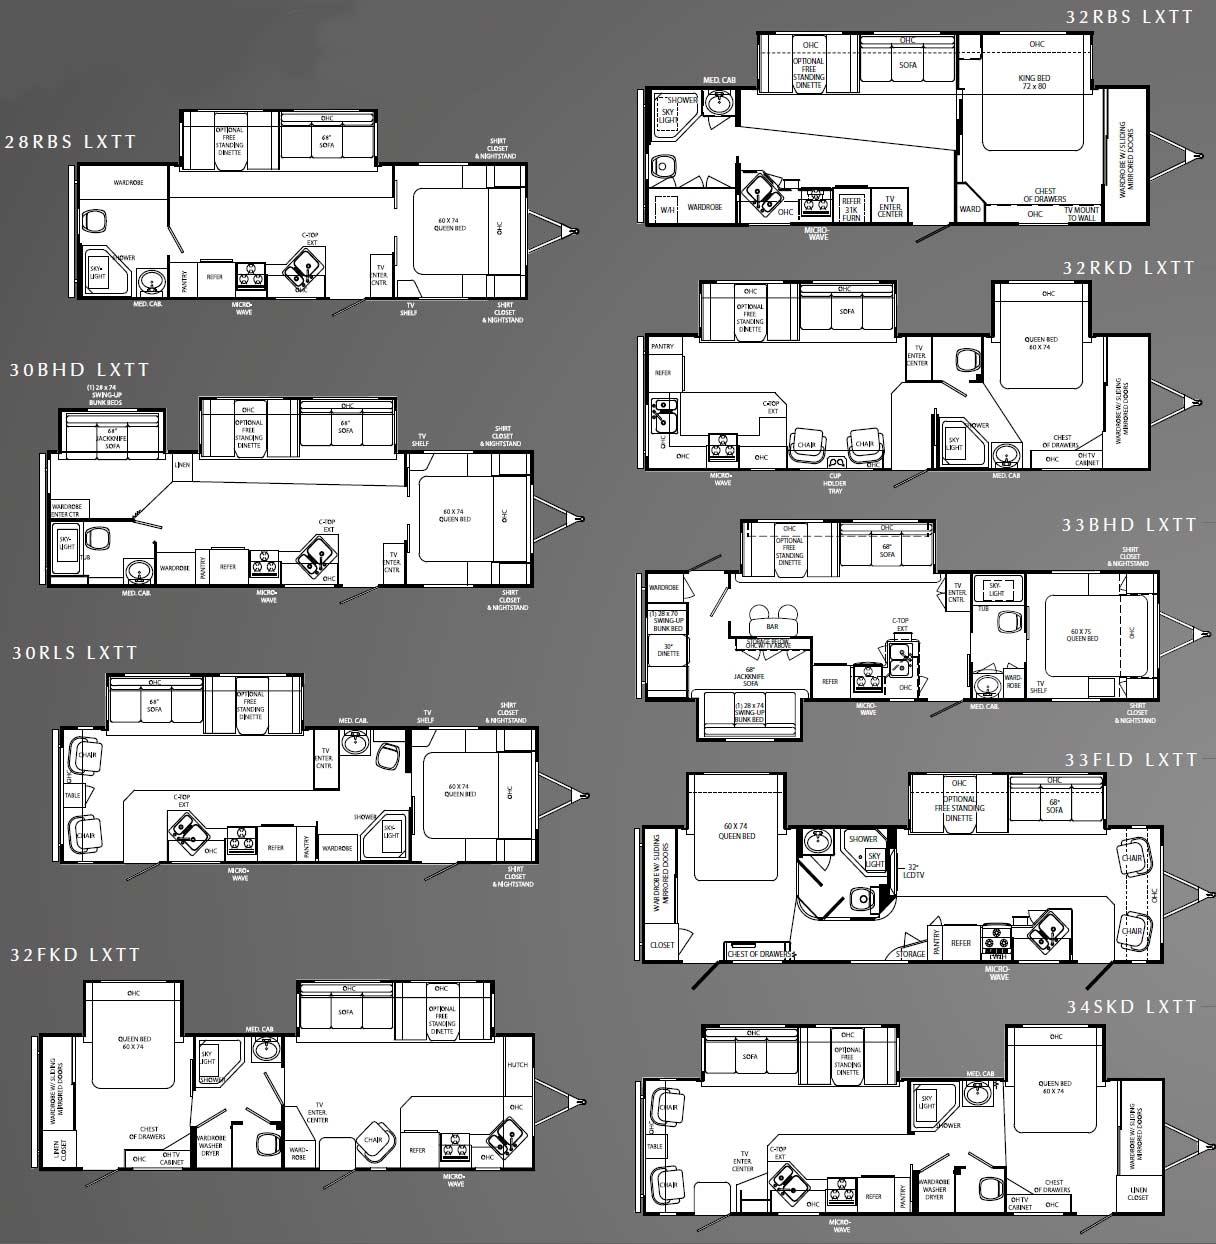 Holiday Rambler Wiring Diagrams 25sb Simple Diagram Rv Motorhomes Floor Plans Wikizie Co